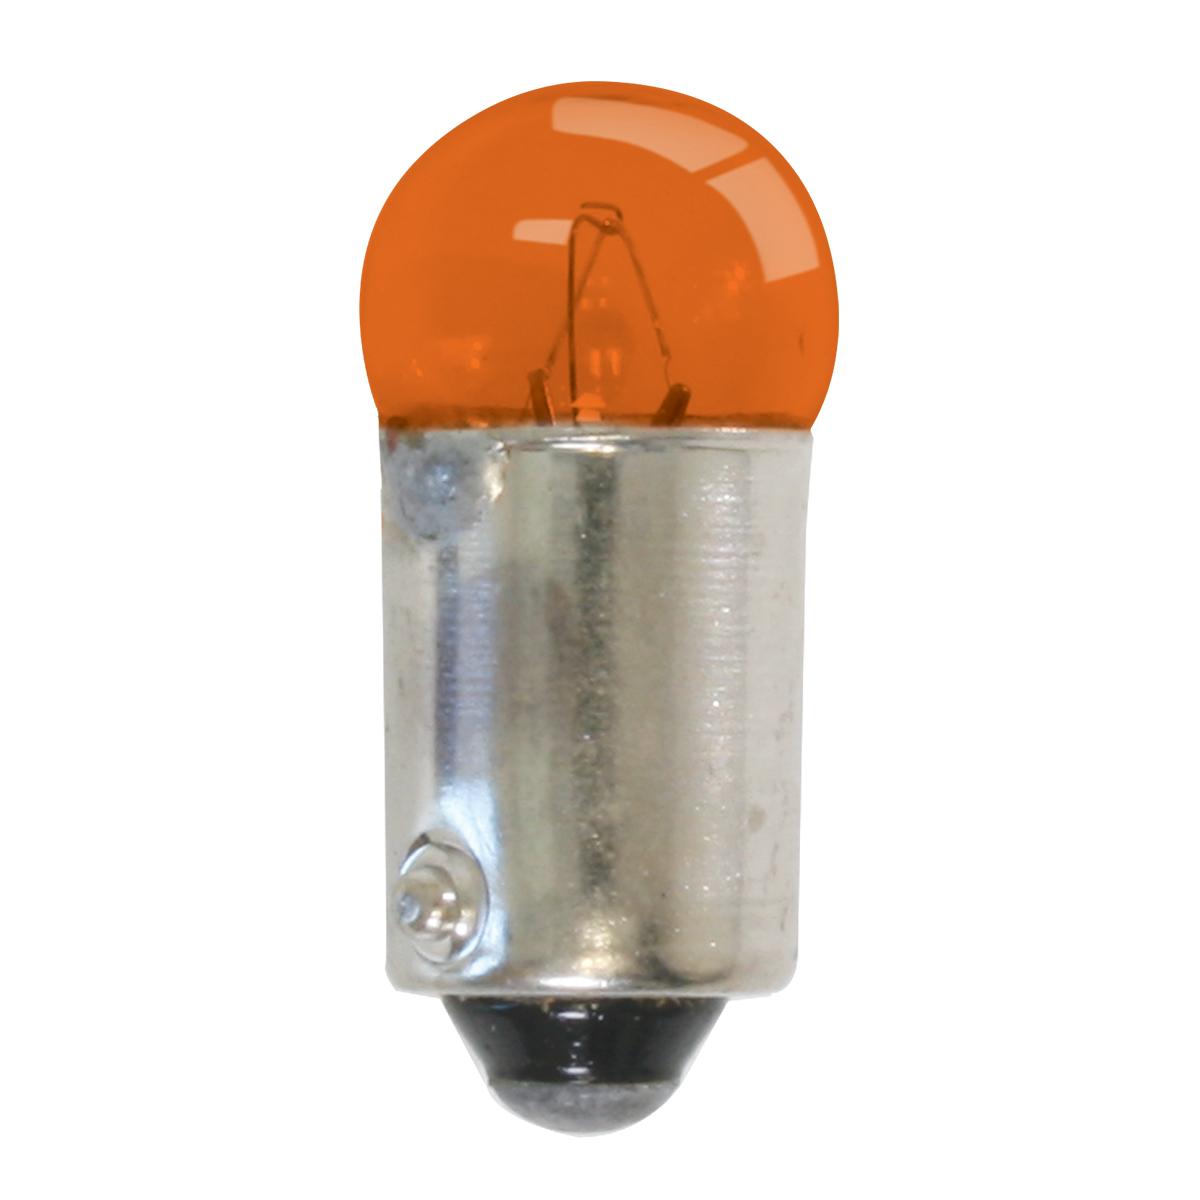 #79090 Miniature Replacement #53 Amber Light Bulb